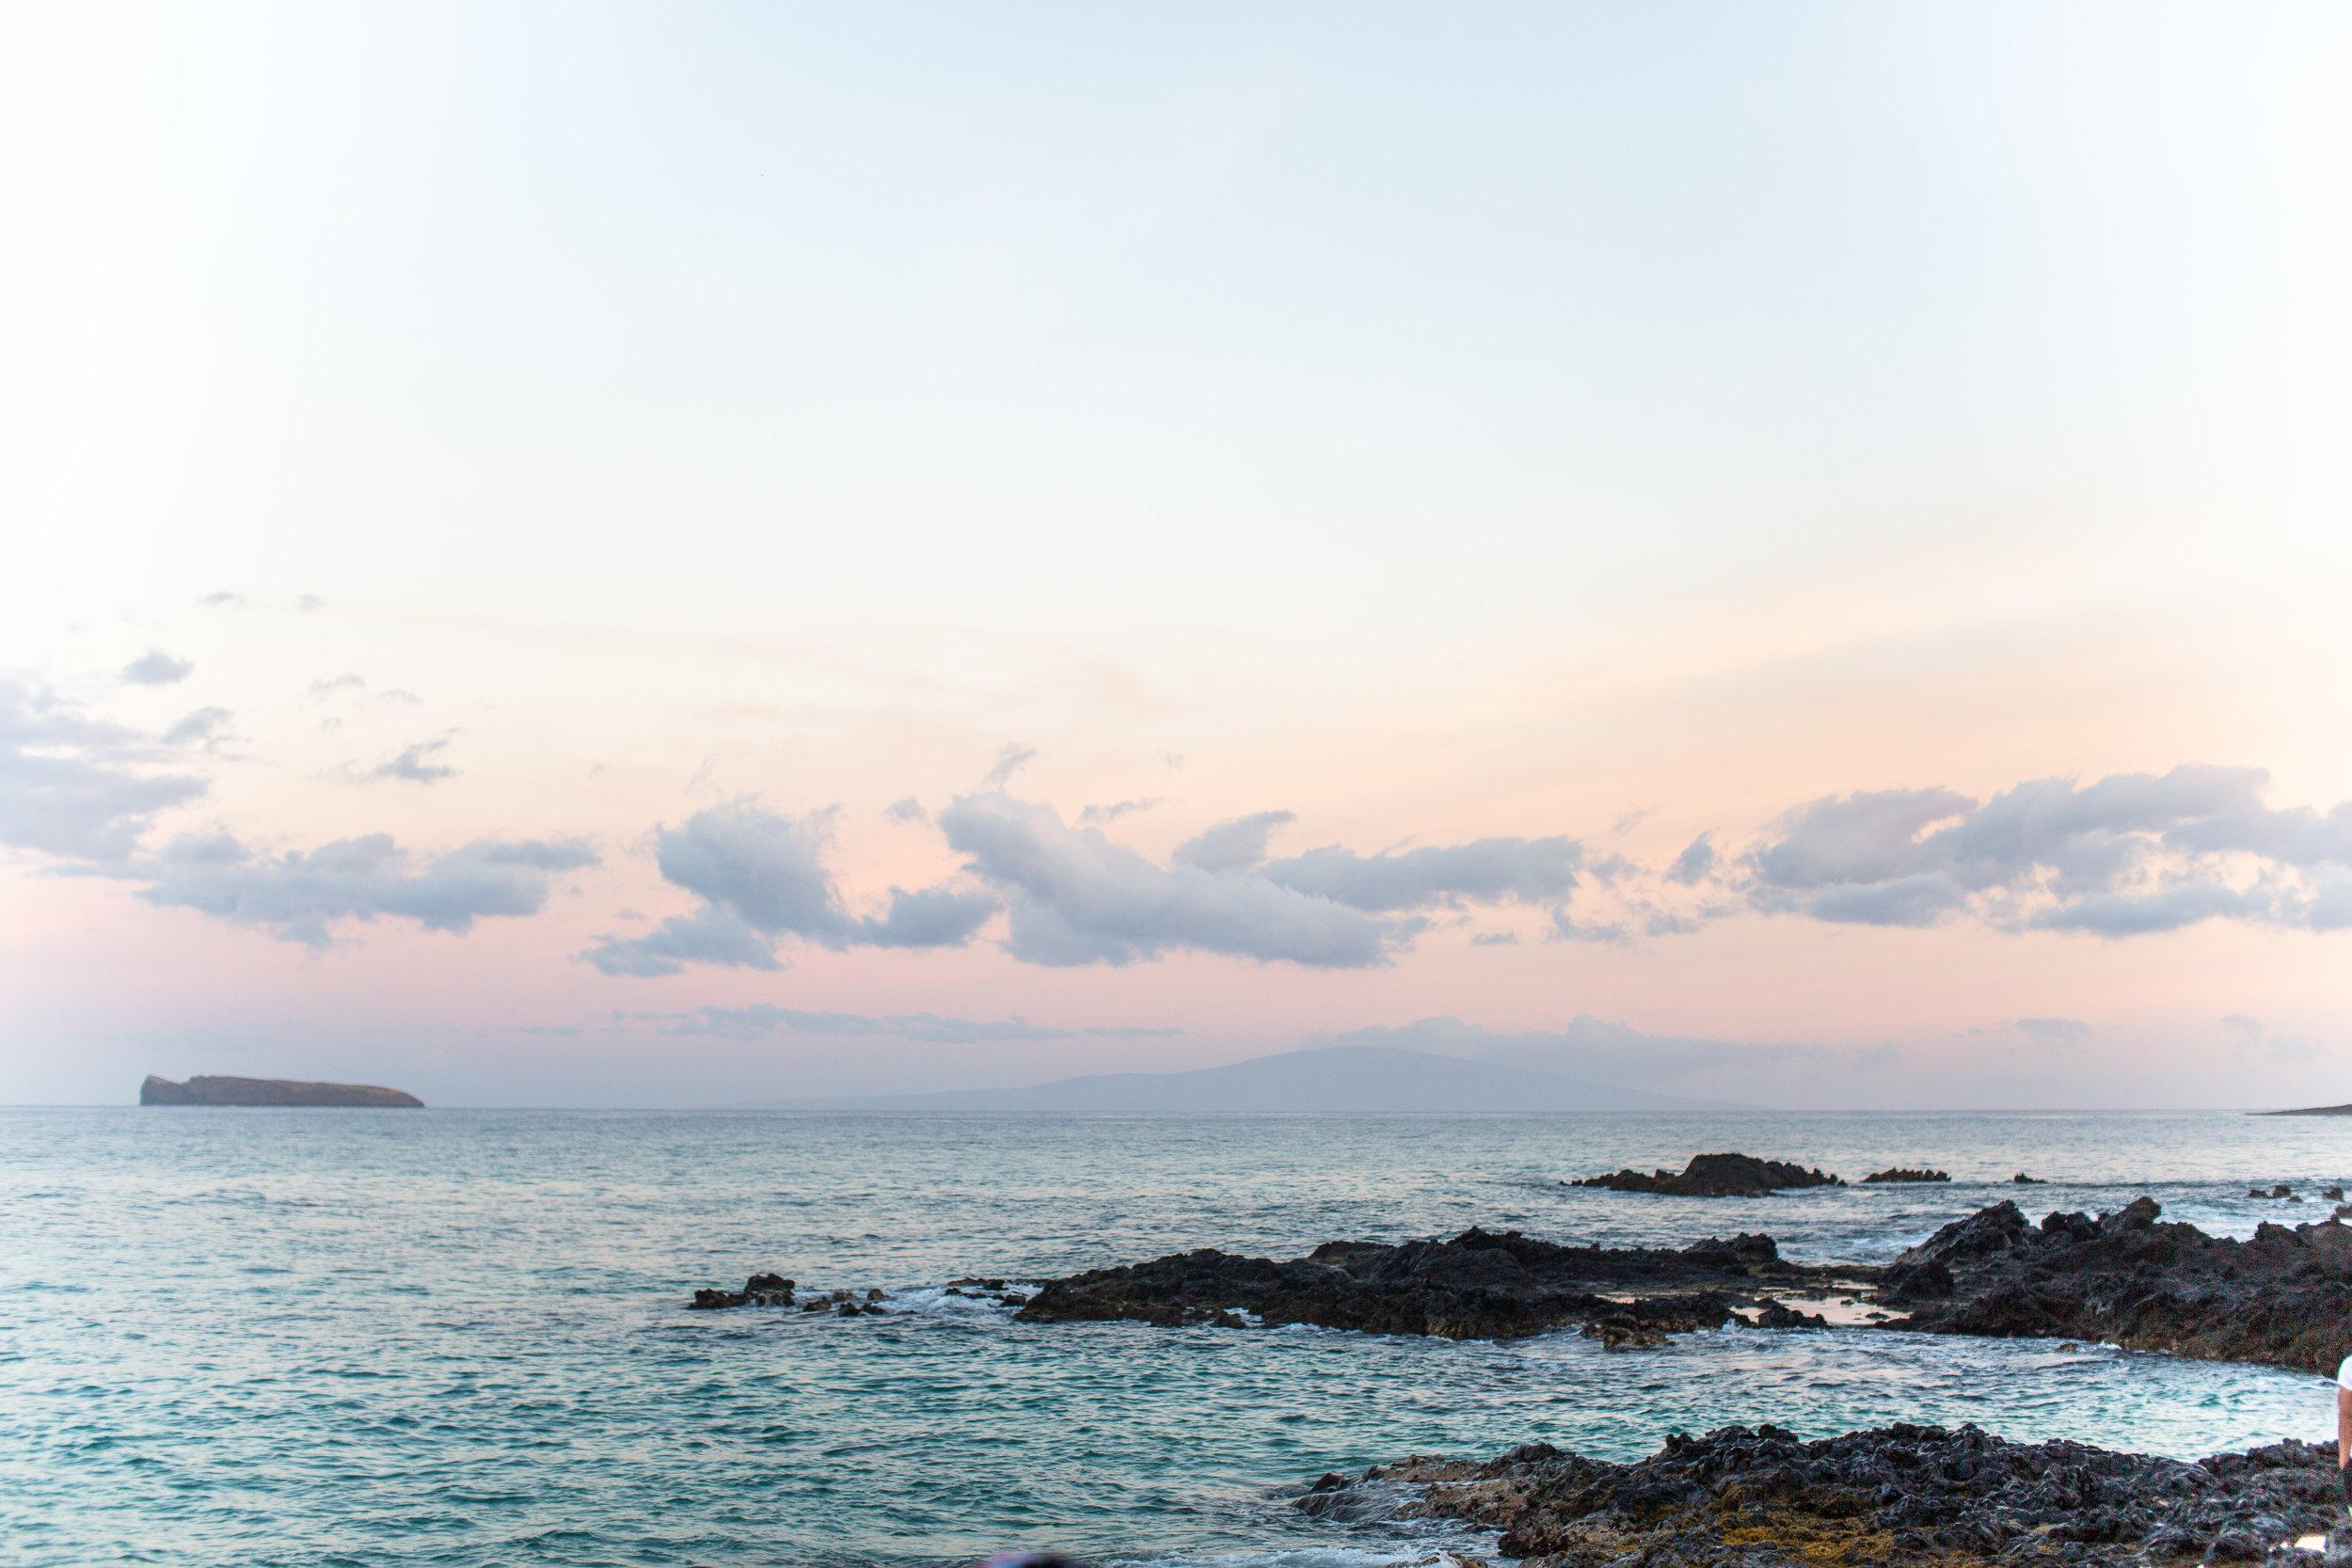 fizz-fade-hawaii-sunrise-stripes2-70.jpg